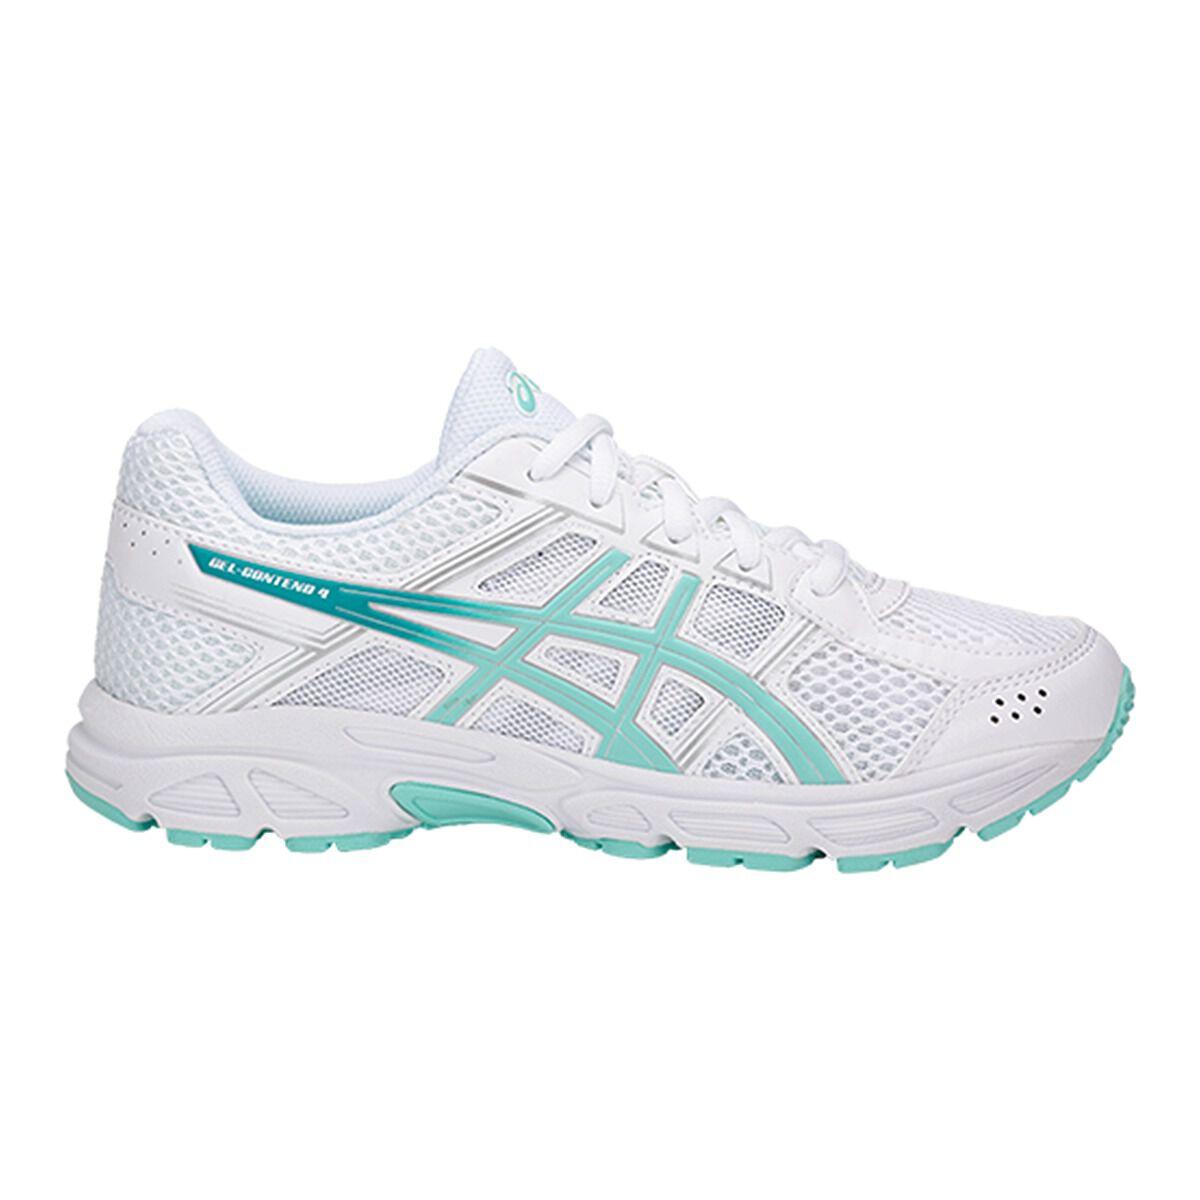 Girls' Running Shoes | Running Shoes For Girls, Girls